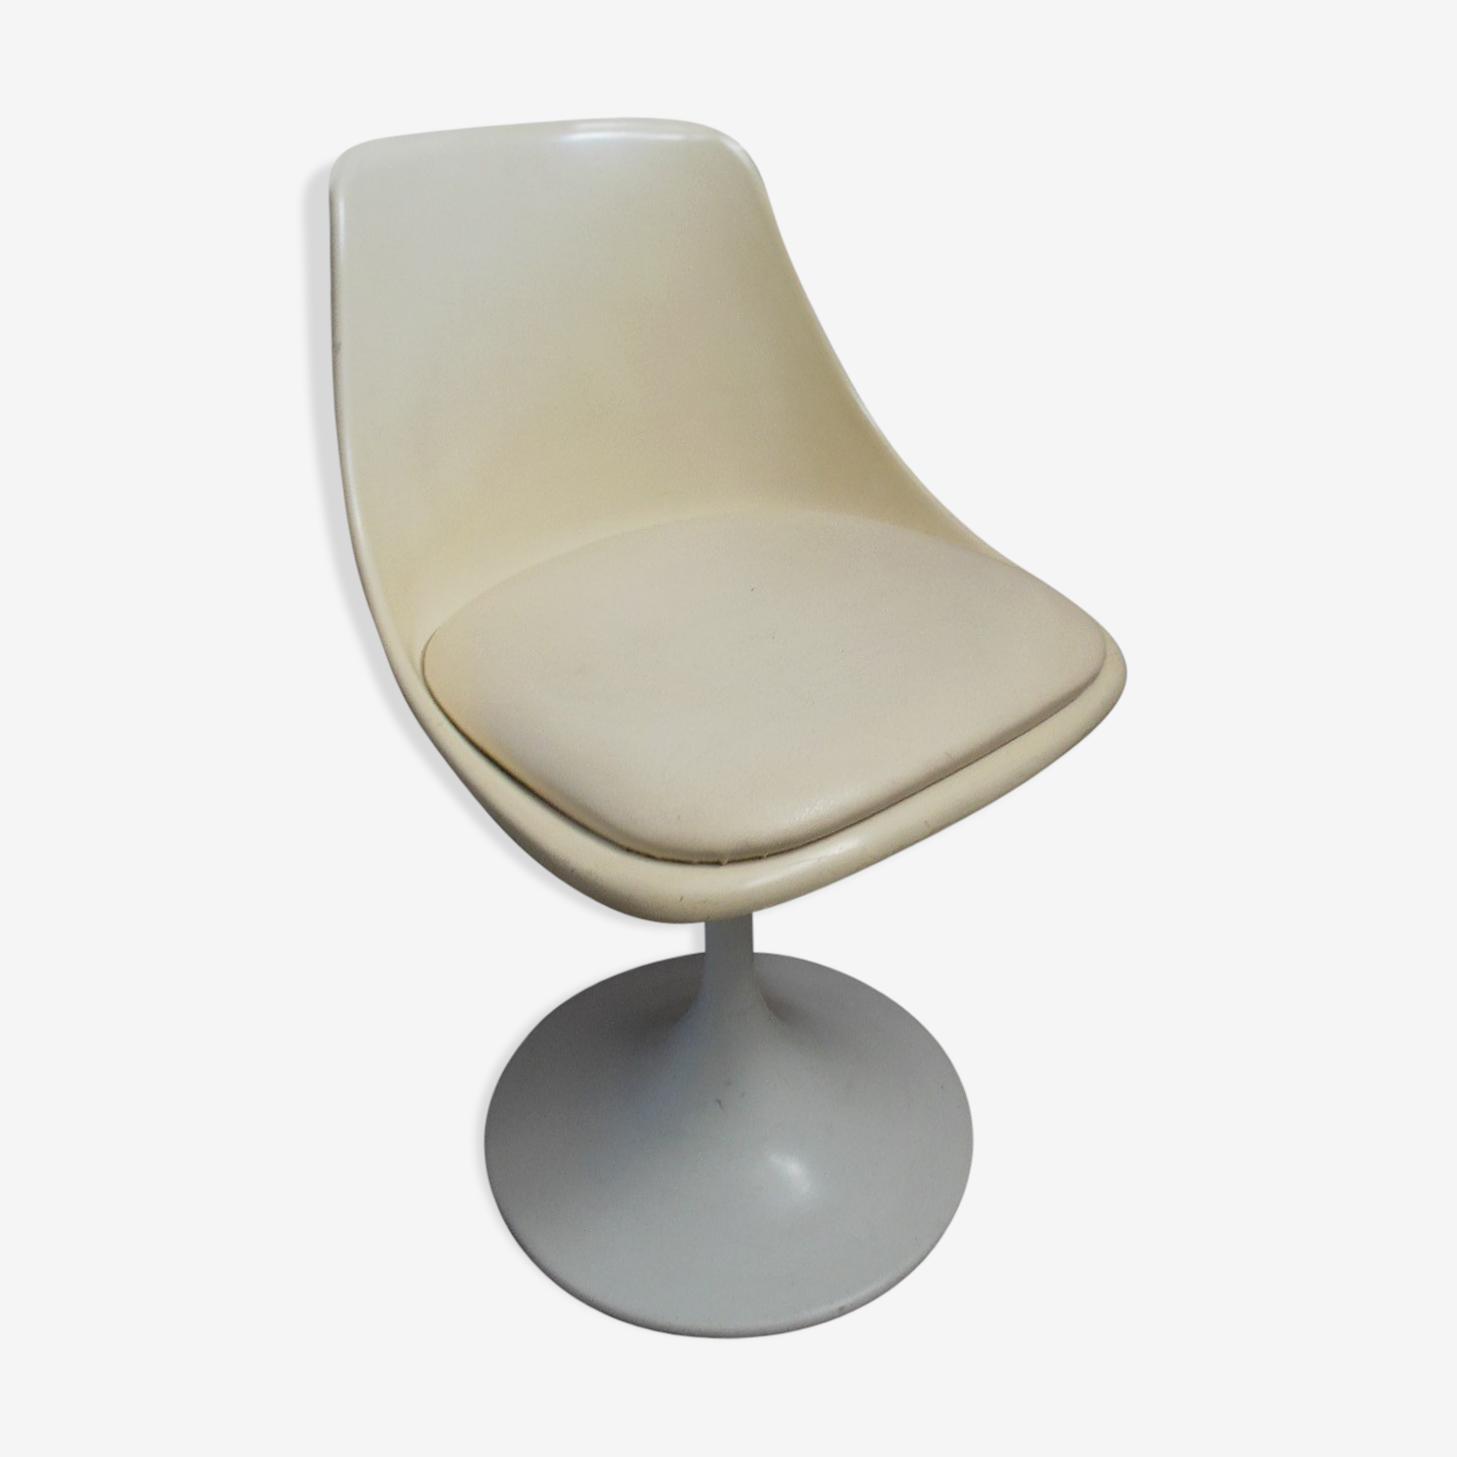 Chaise pied tulipe année 60 fonte blanc vintage AoSyinM